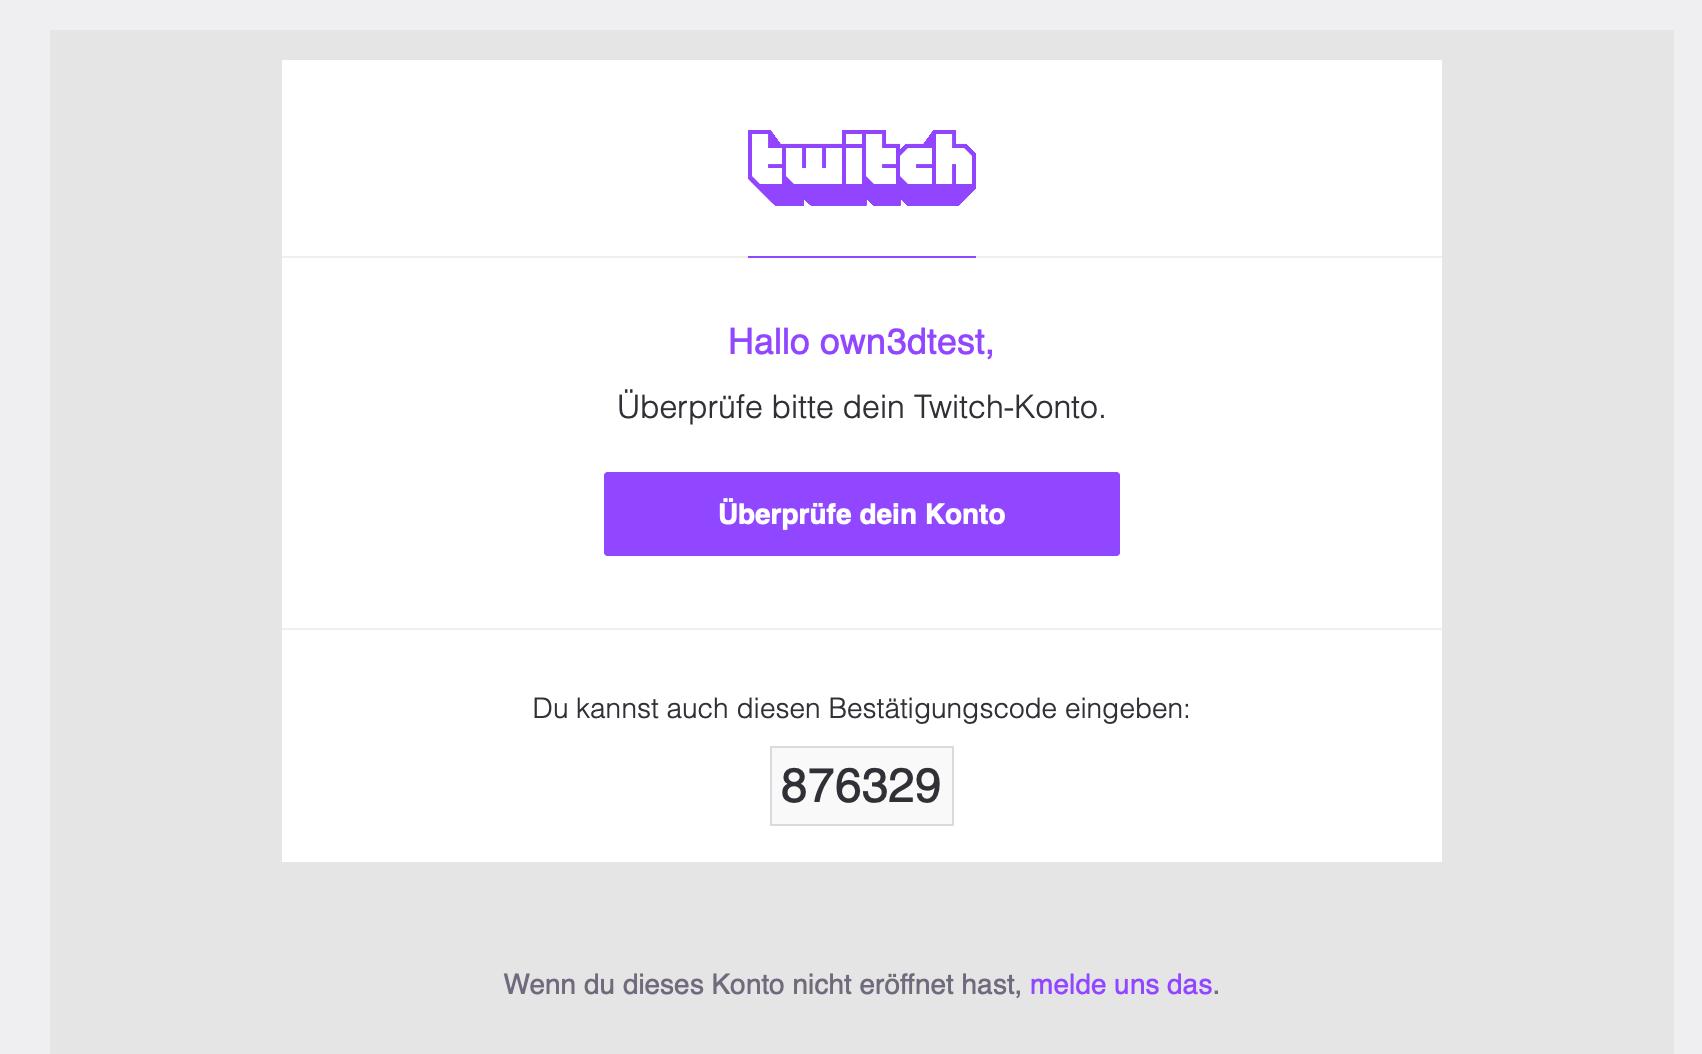 Código de verificación de Twitch